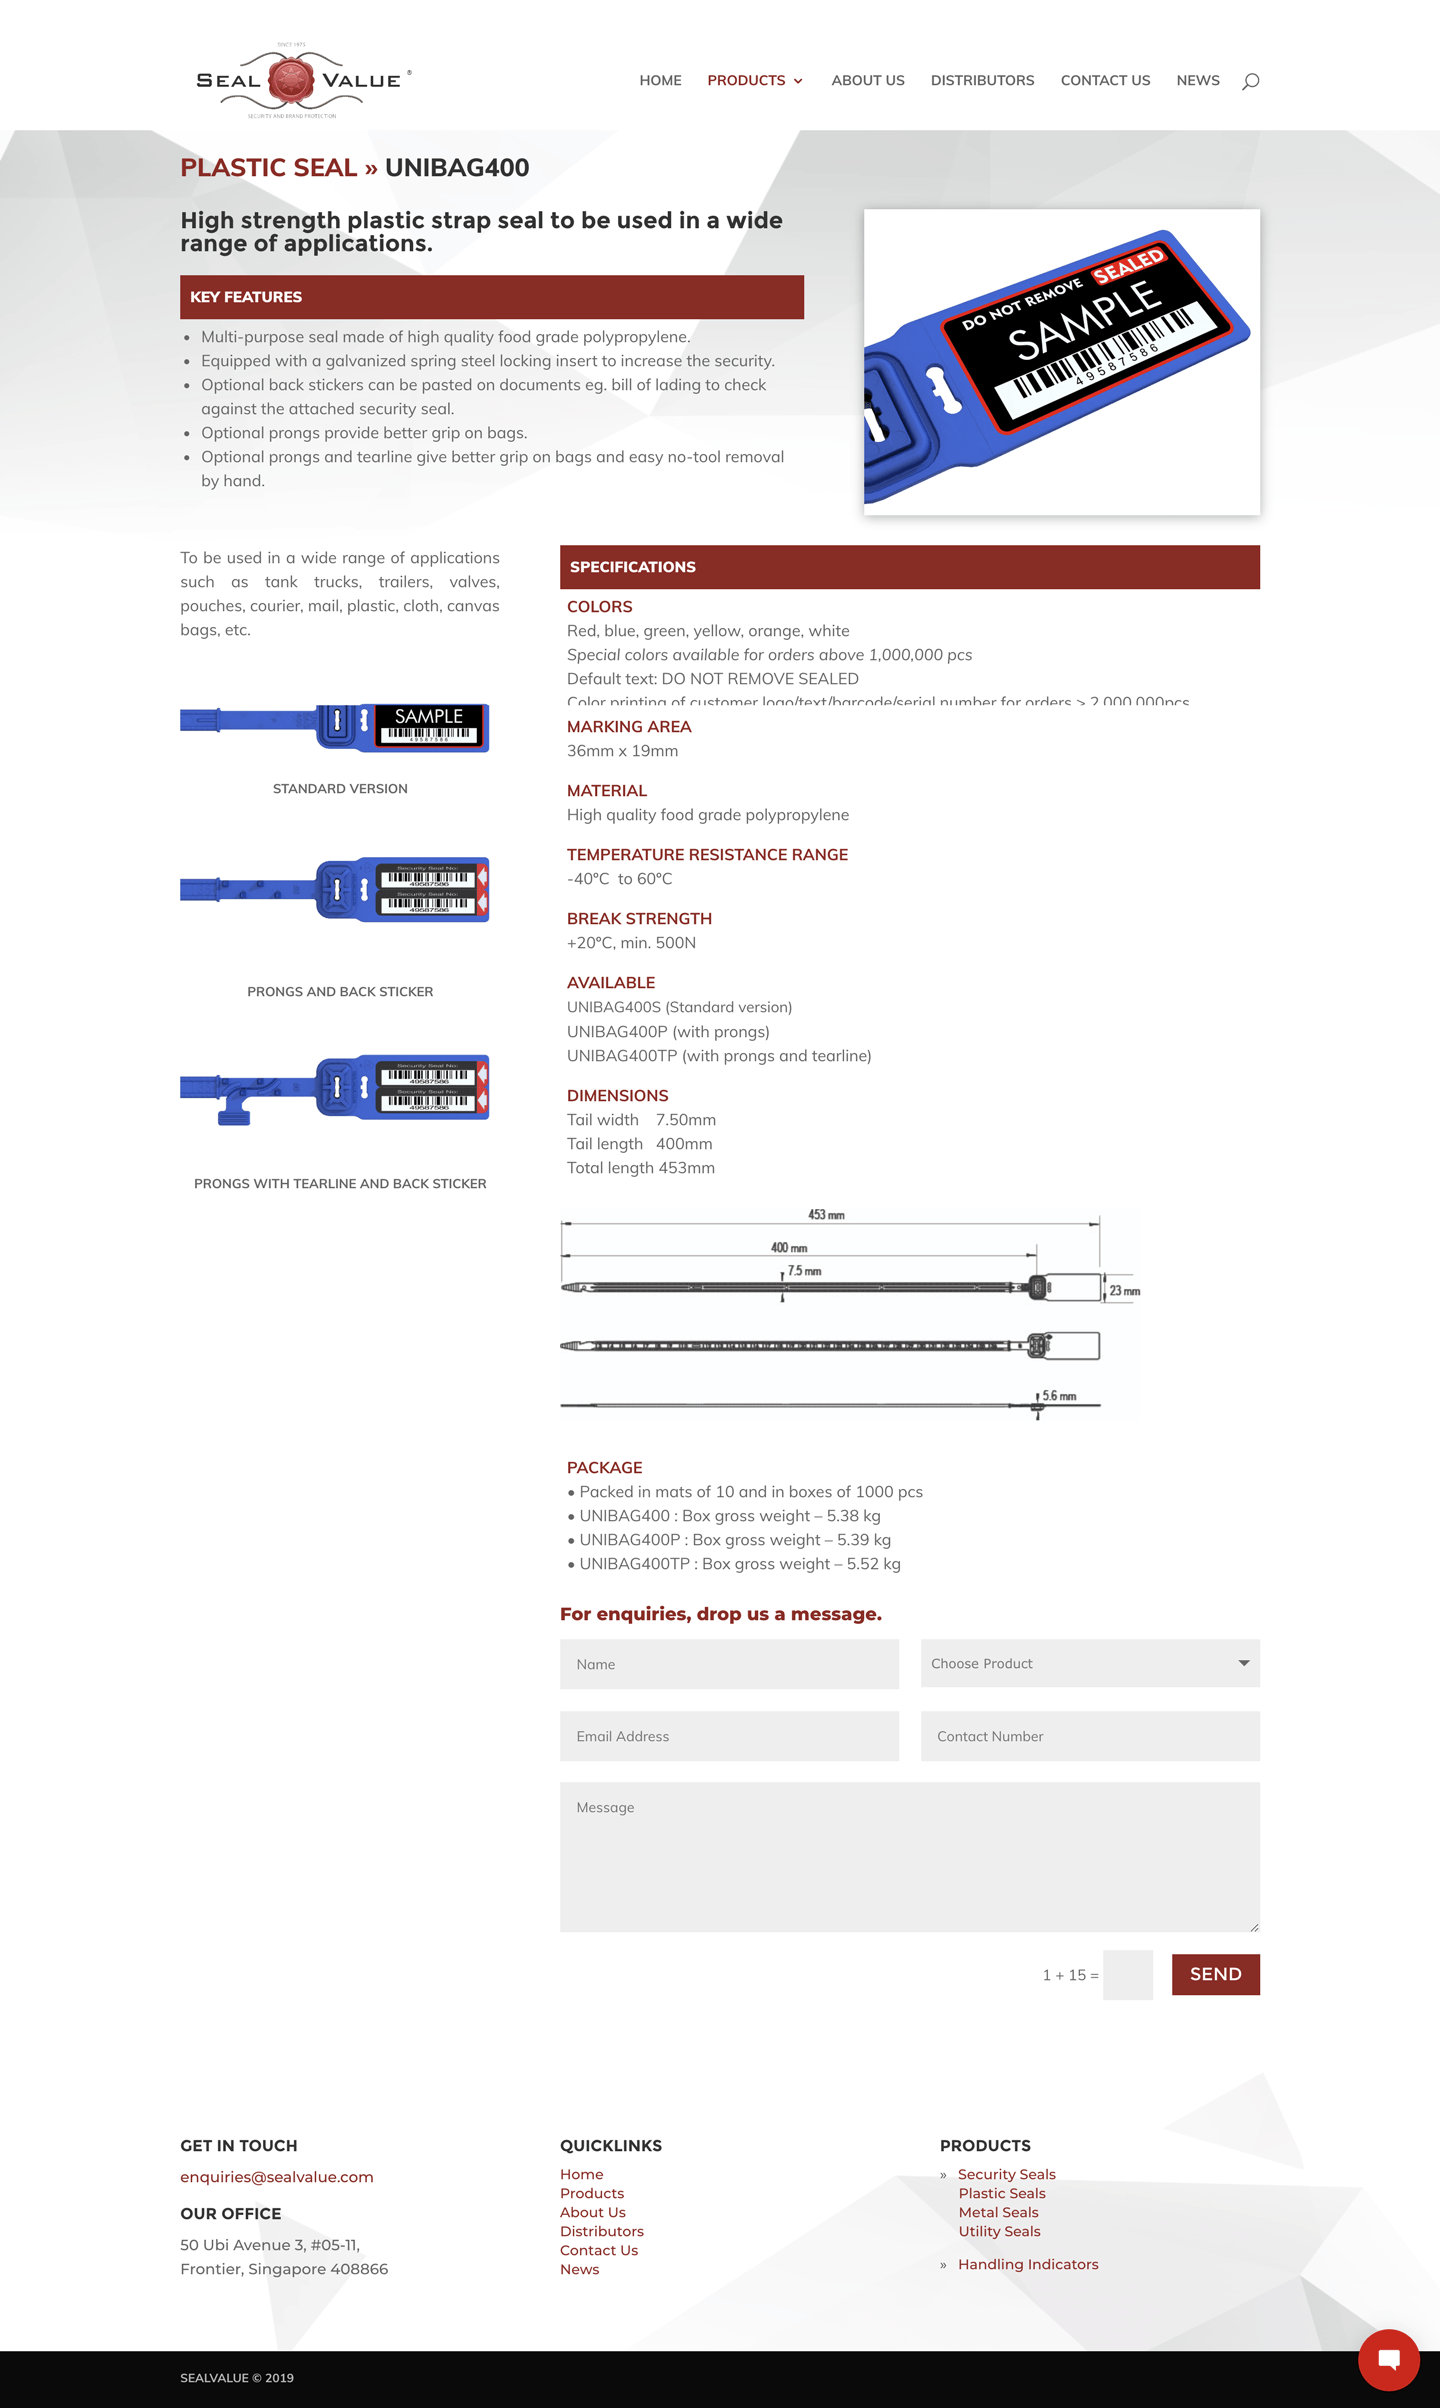 Design & Analytics screenshot-website-2 SealValue